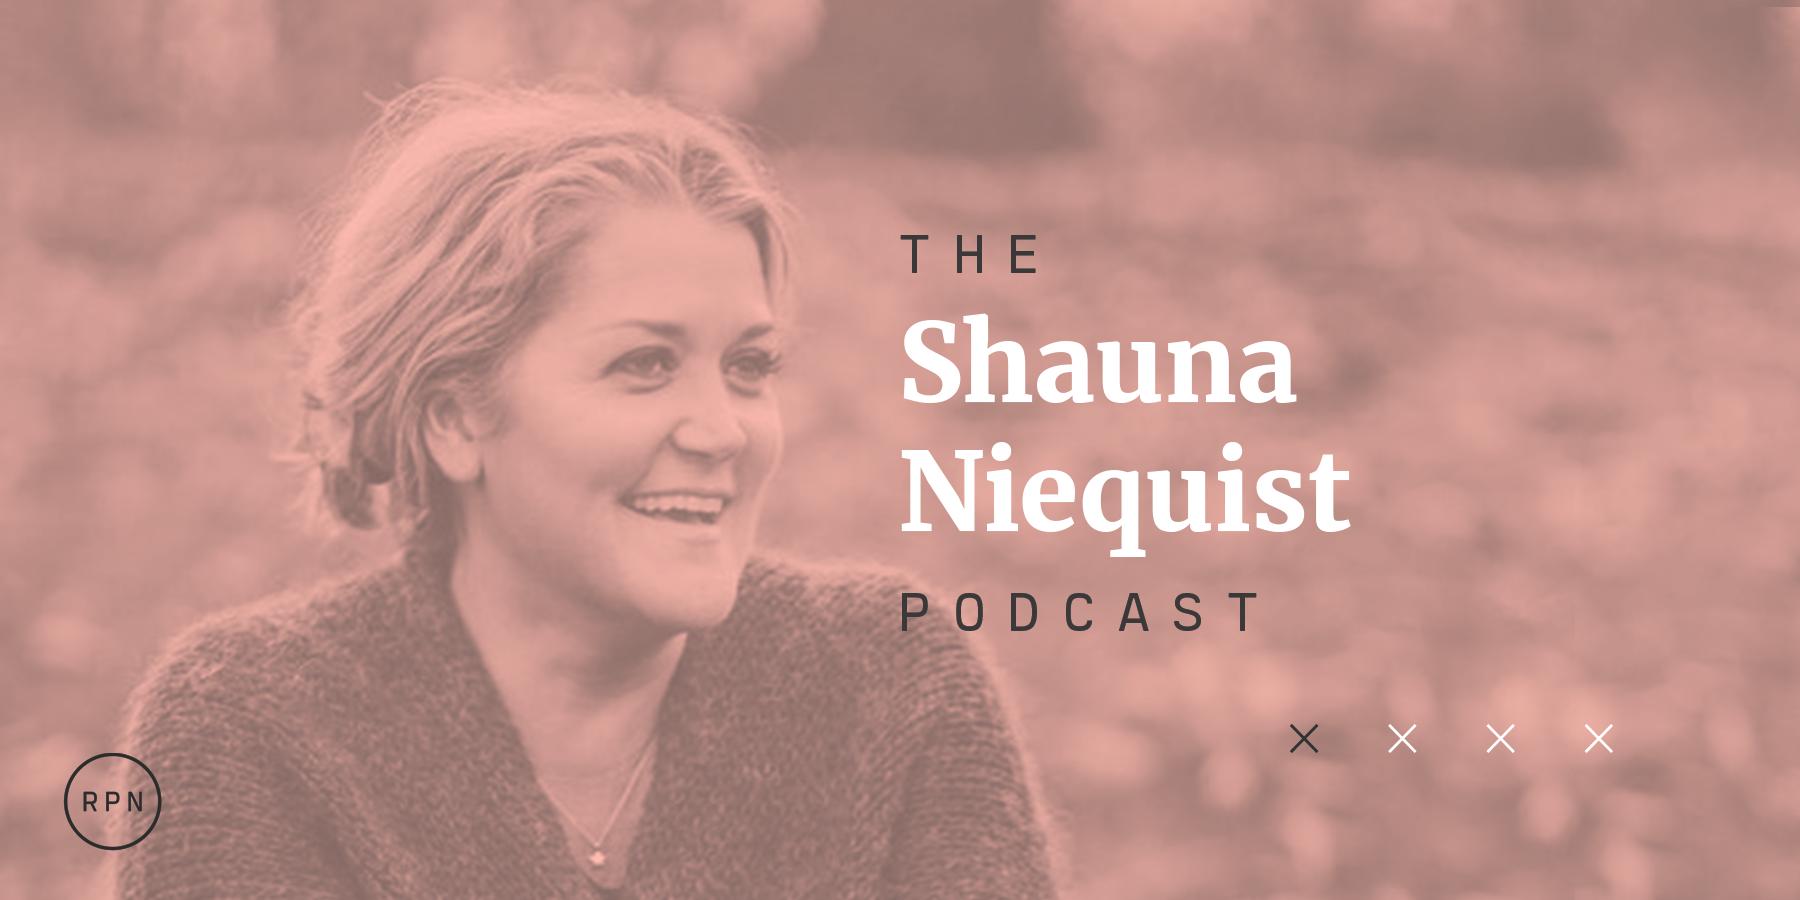 Shauna Niequist Podcast By RELEVANT Magazine